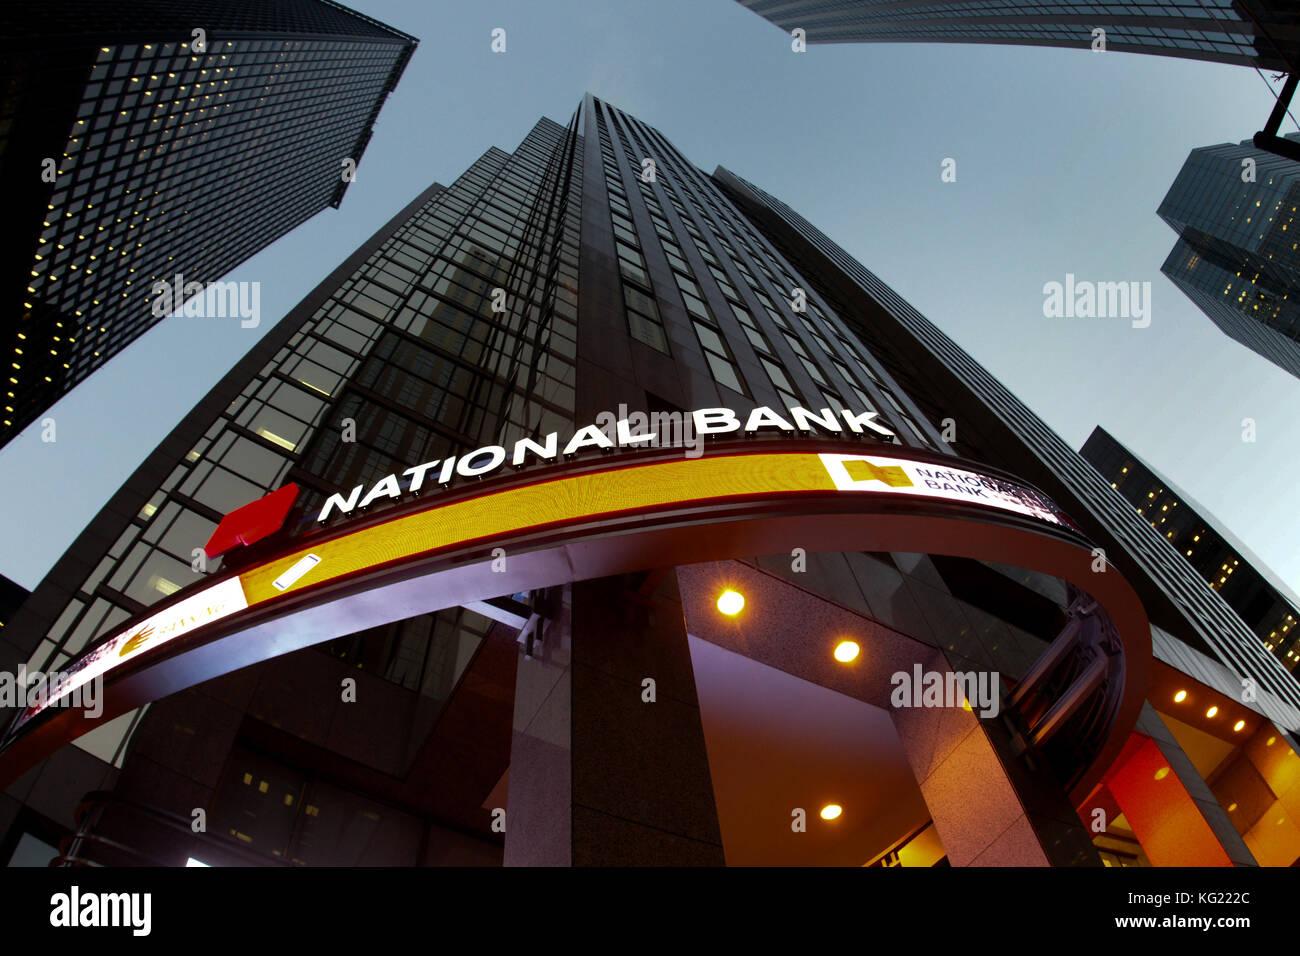 Toronto,Canada,16 November,2011.National bank headquarters in downtown Toronto,Ontario. Credit:Mario Beauregard/Alamy - Stock Image